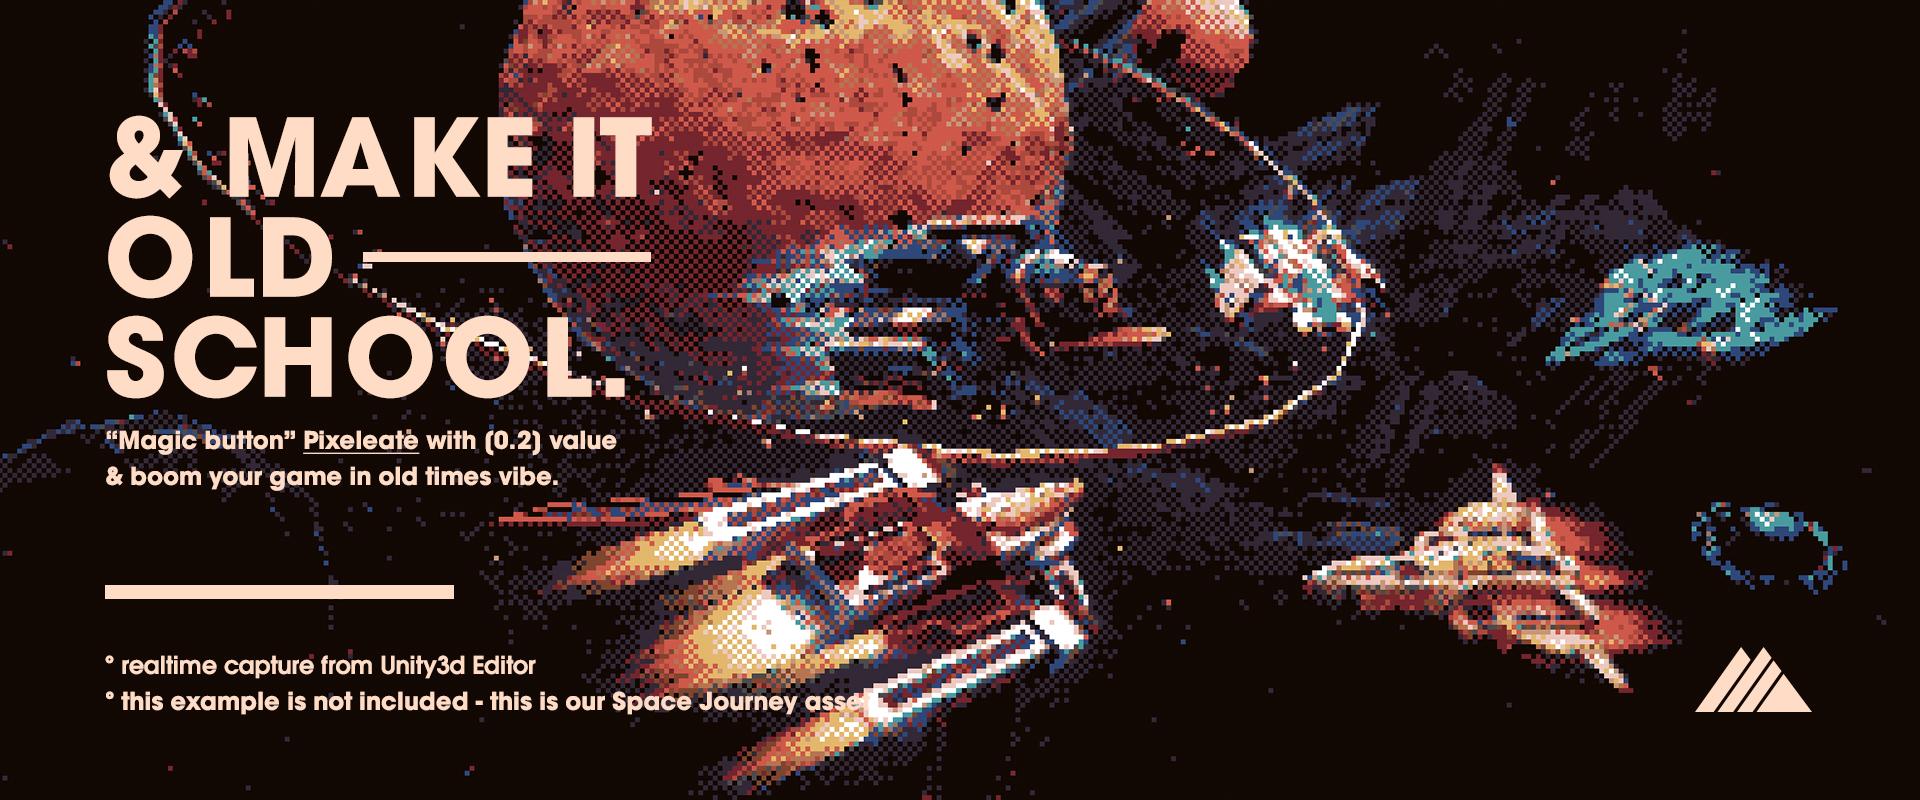 SpaceJourney_2.jpg